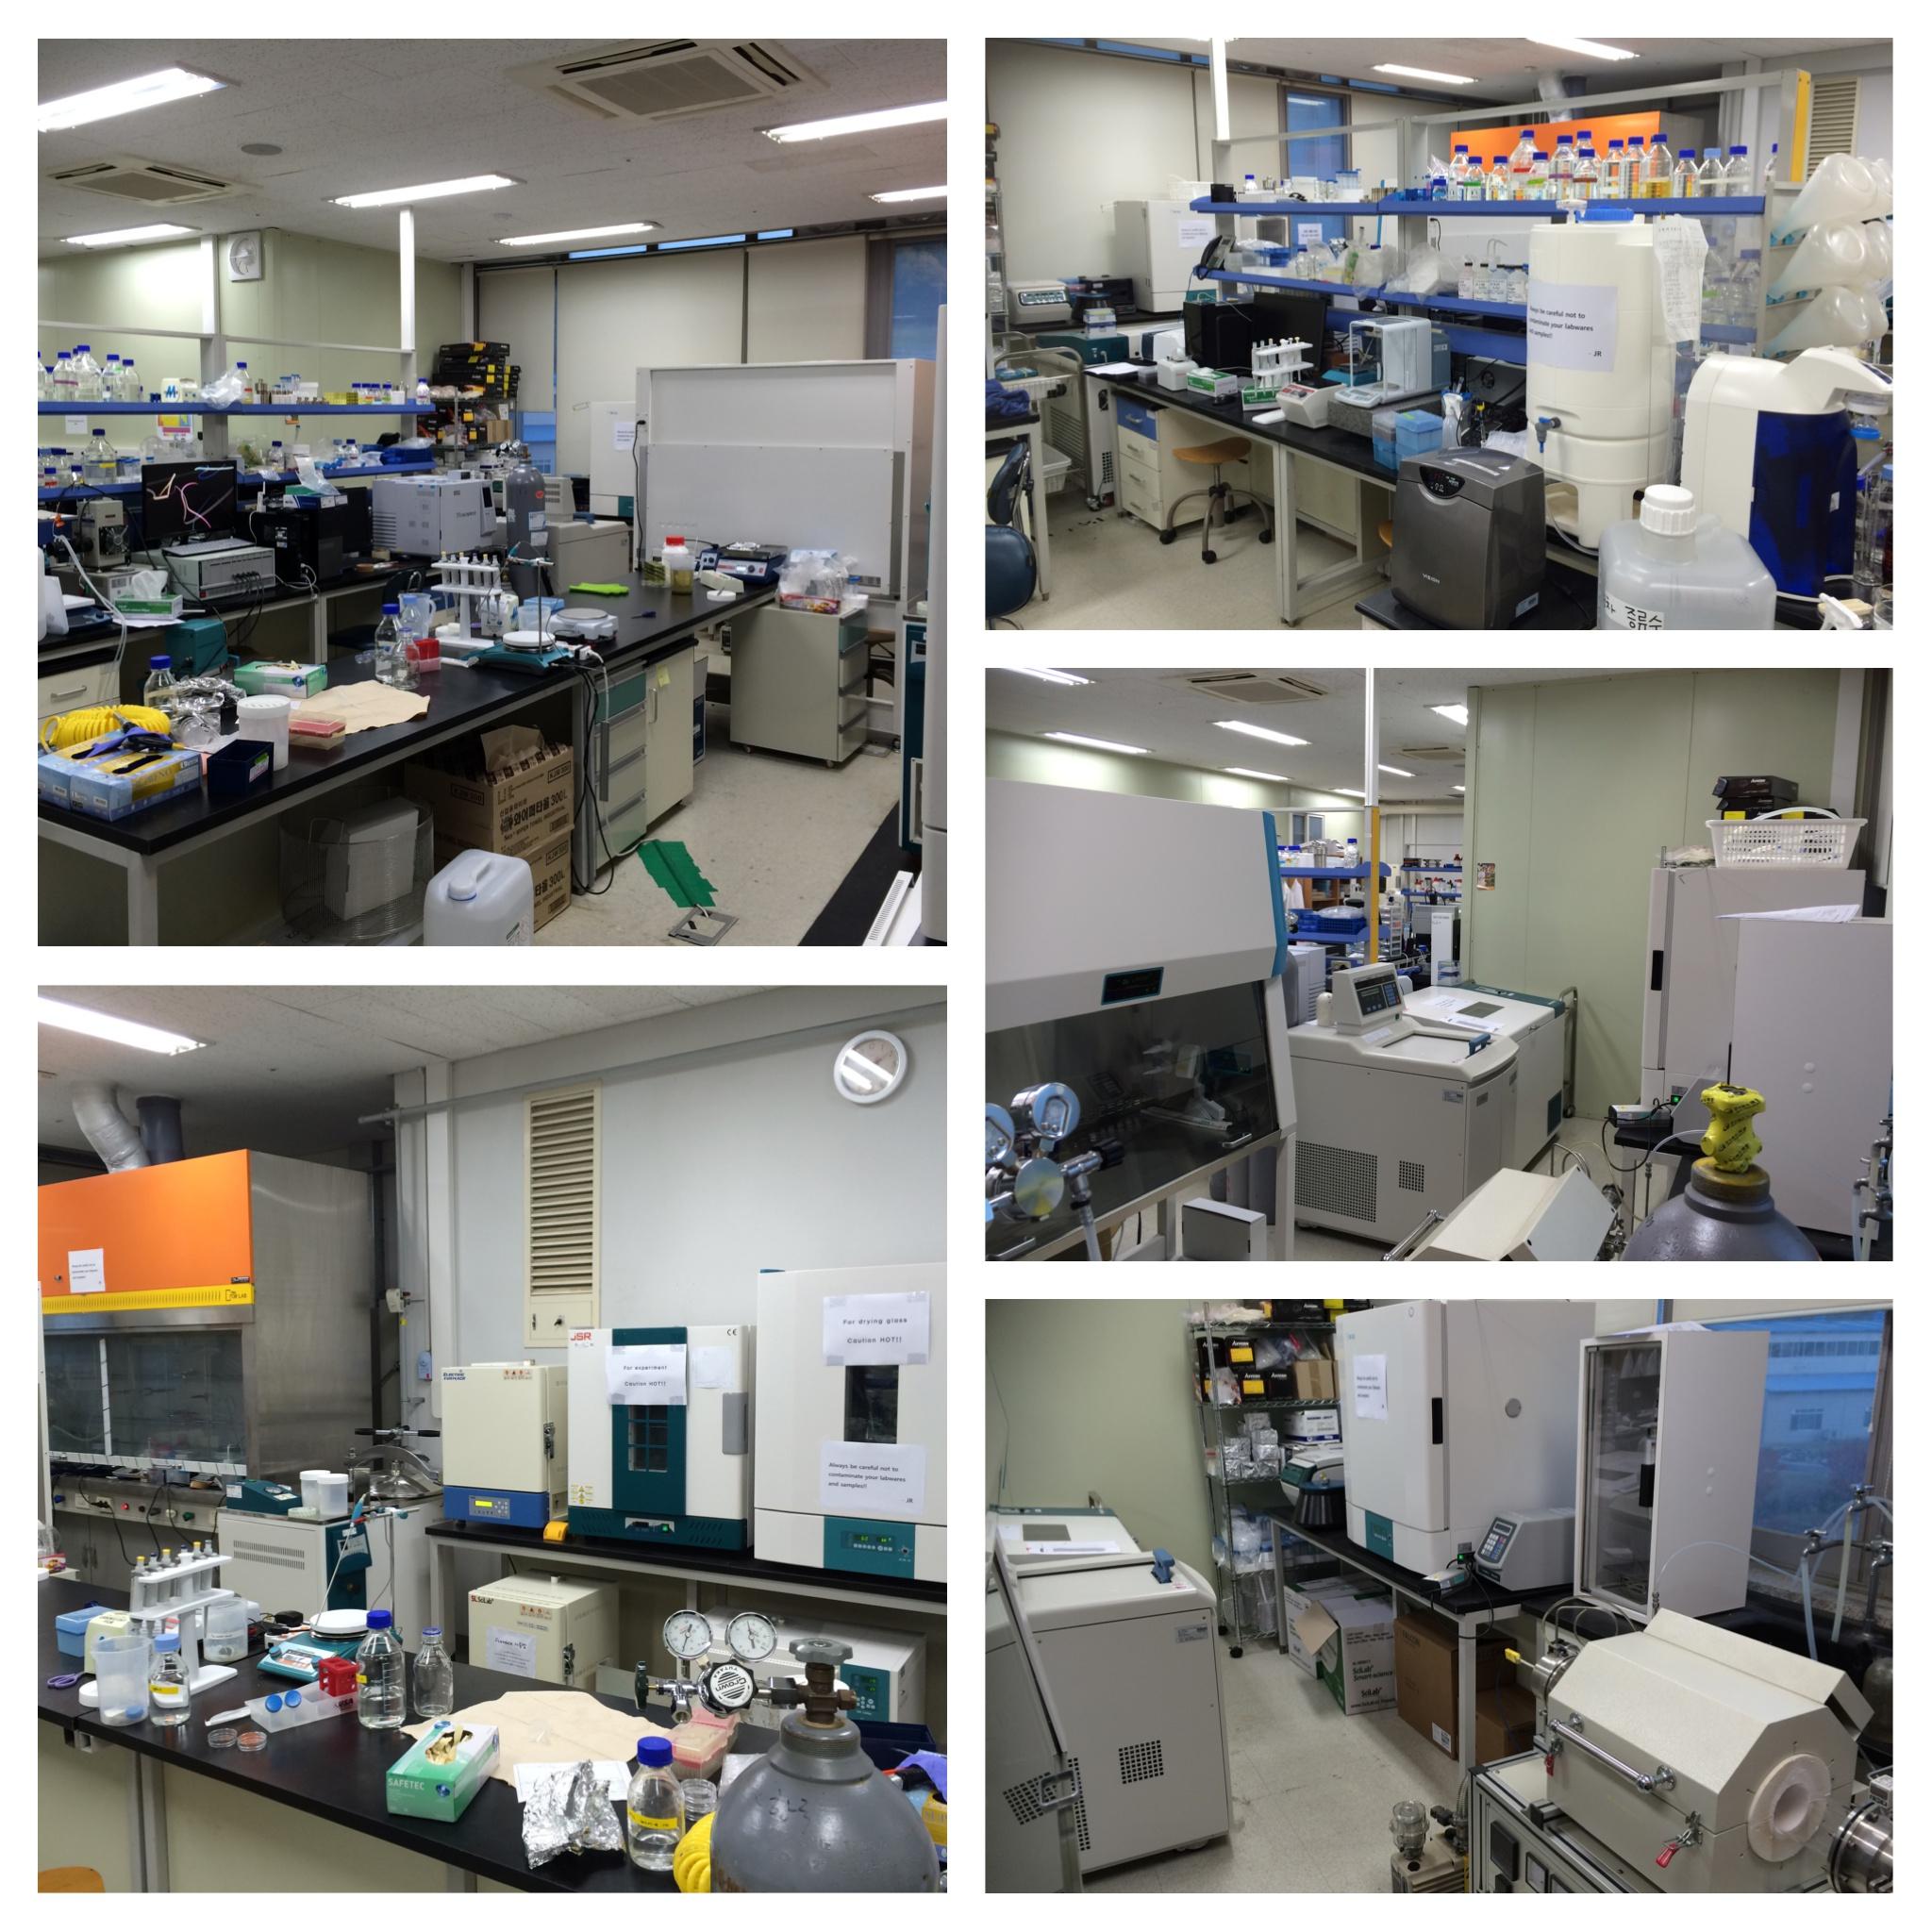 Lab. Scenery